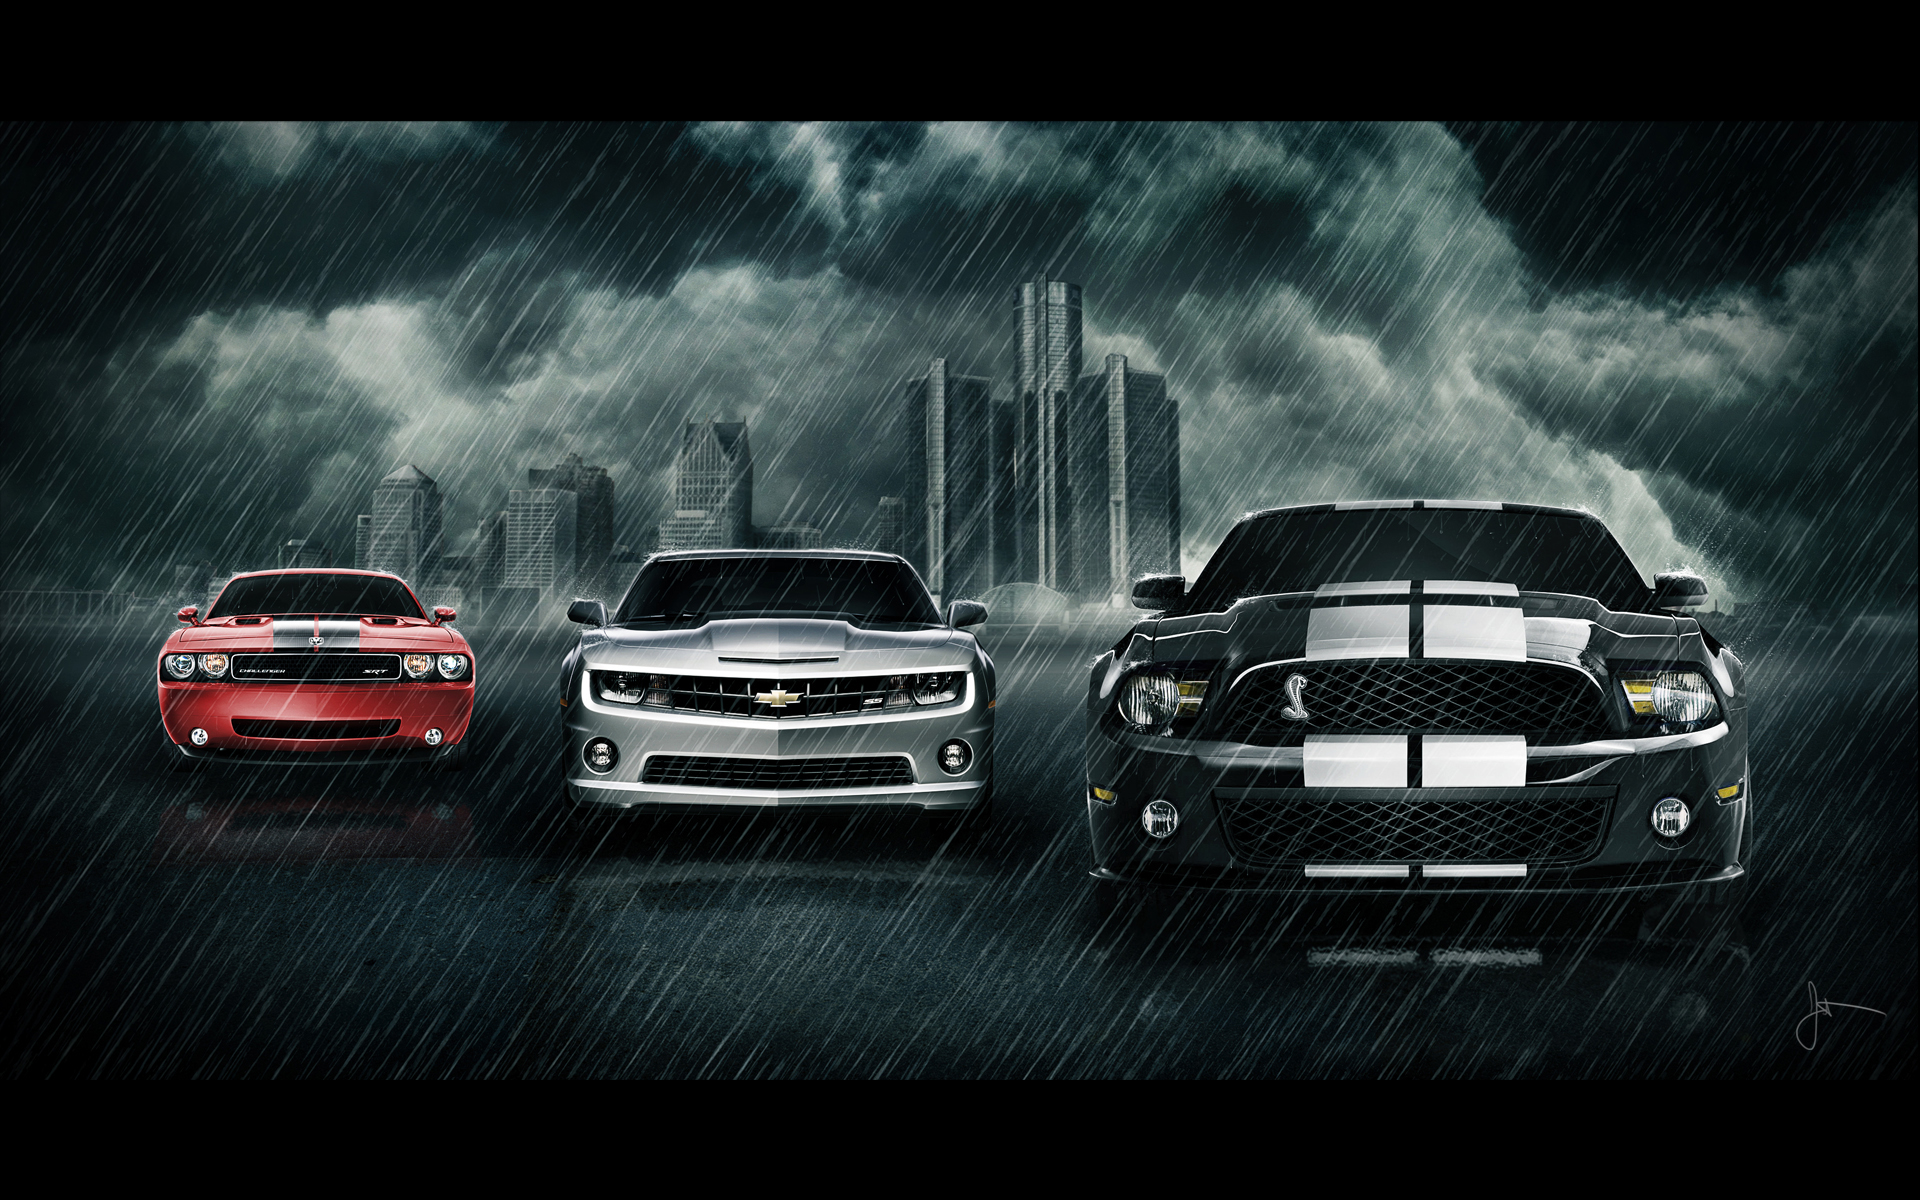 Chevy Camaro Parade Exclusive HD Wallpapers 200 1920x1200